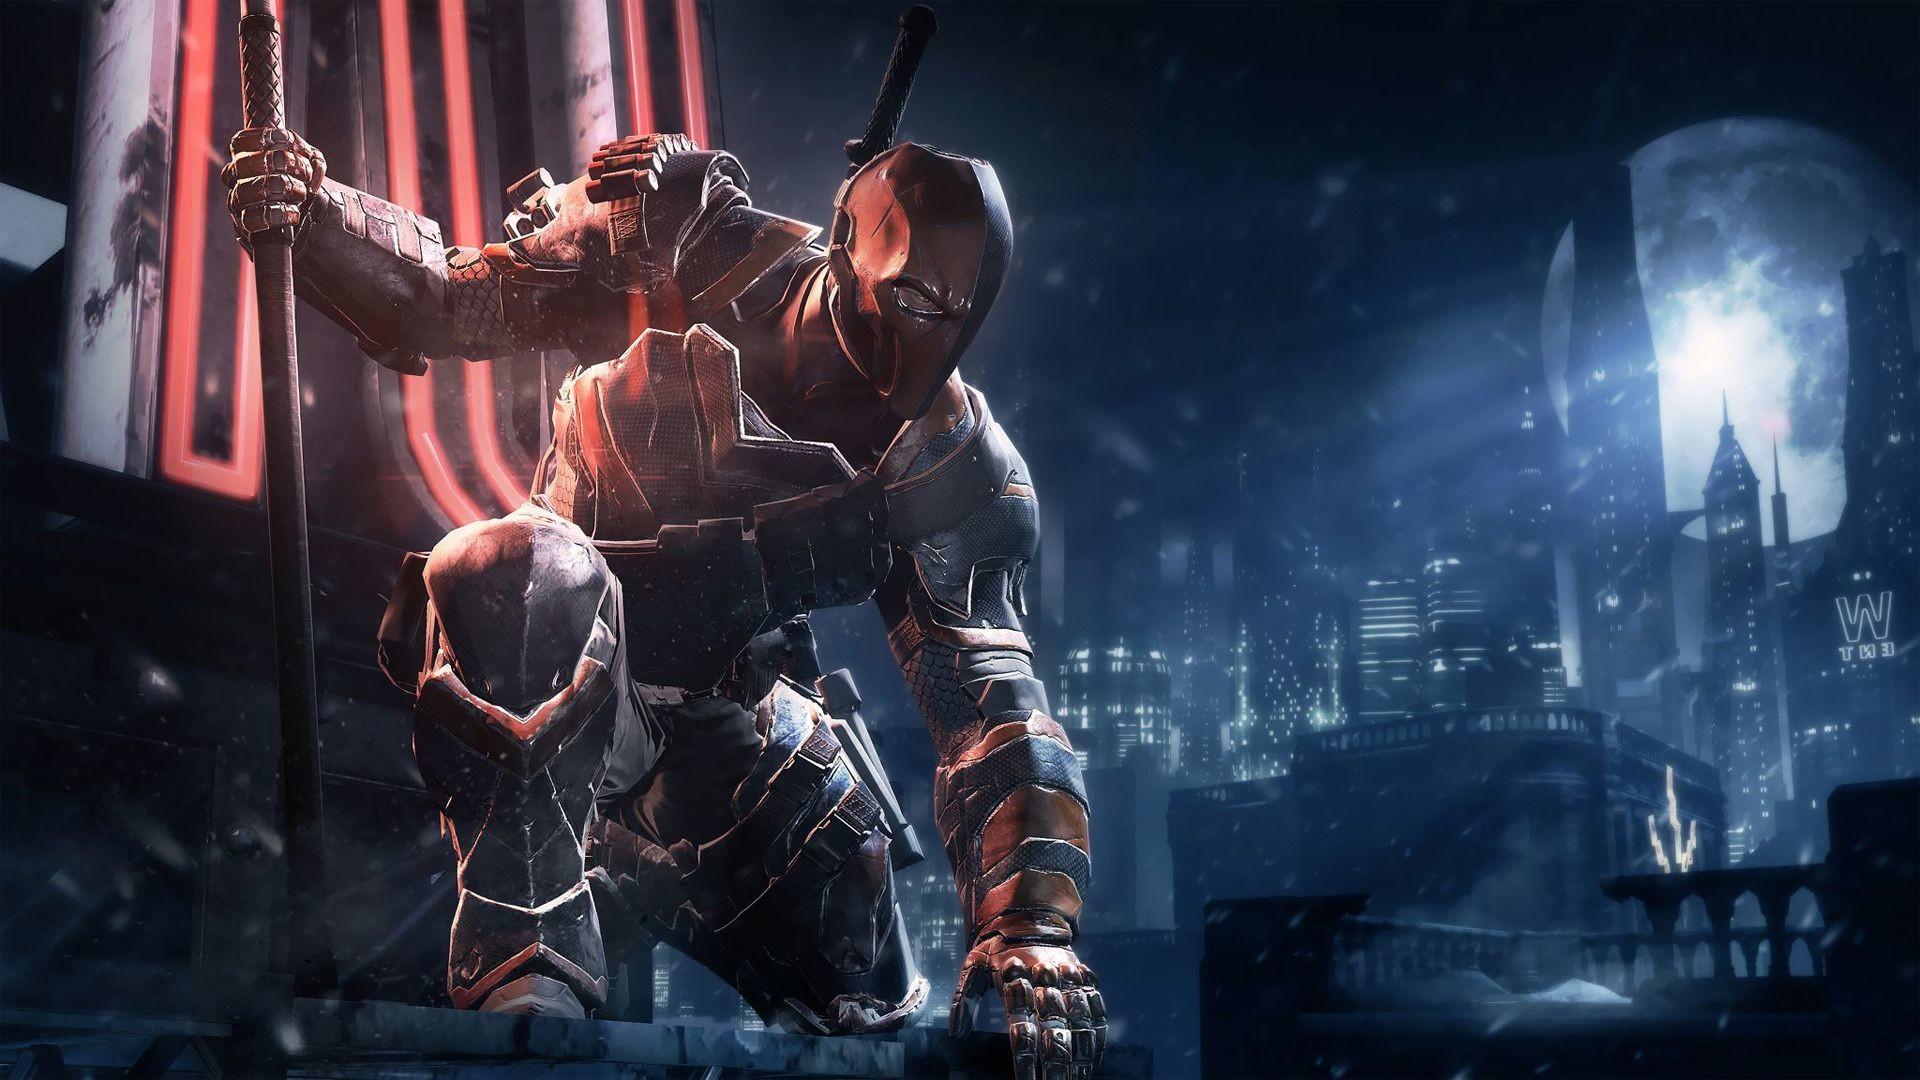 Deathstroke Batman Arkham Origins   HD Games Wallpaper Free Download …